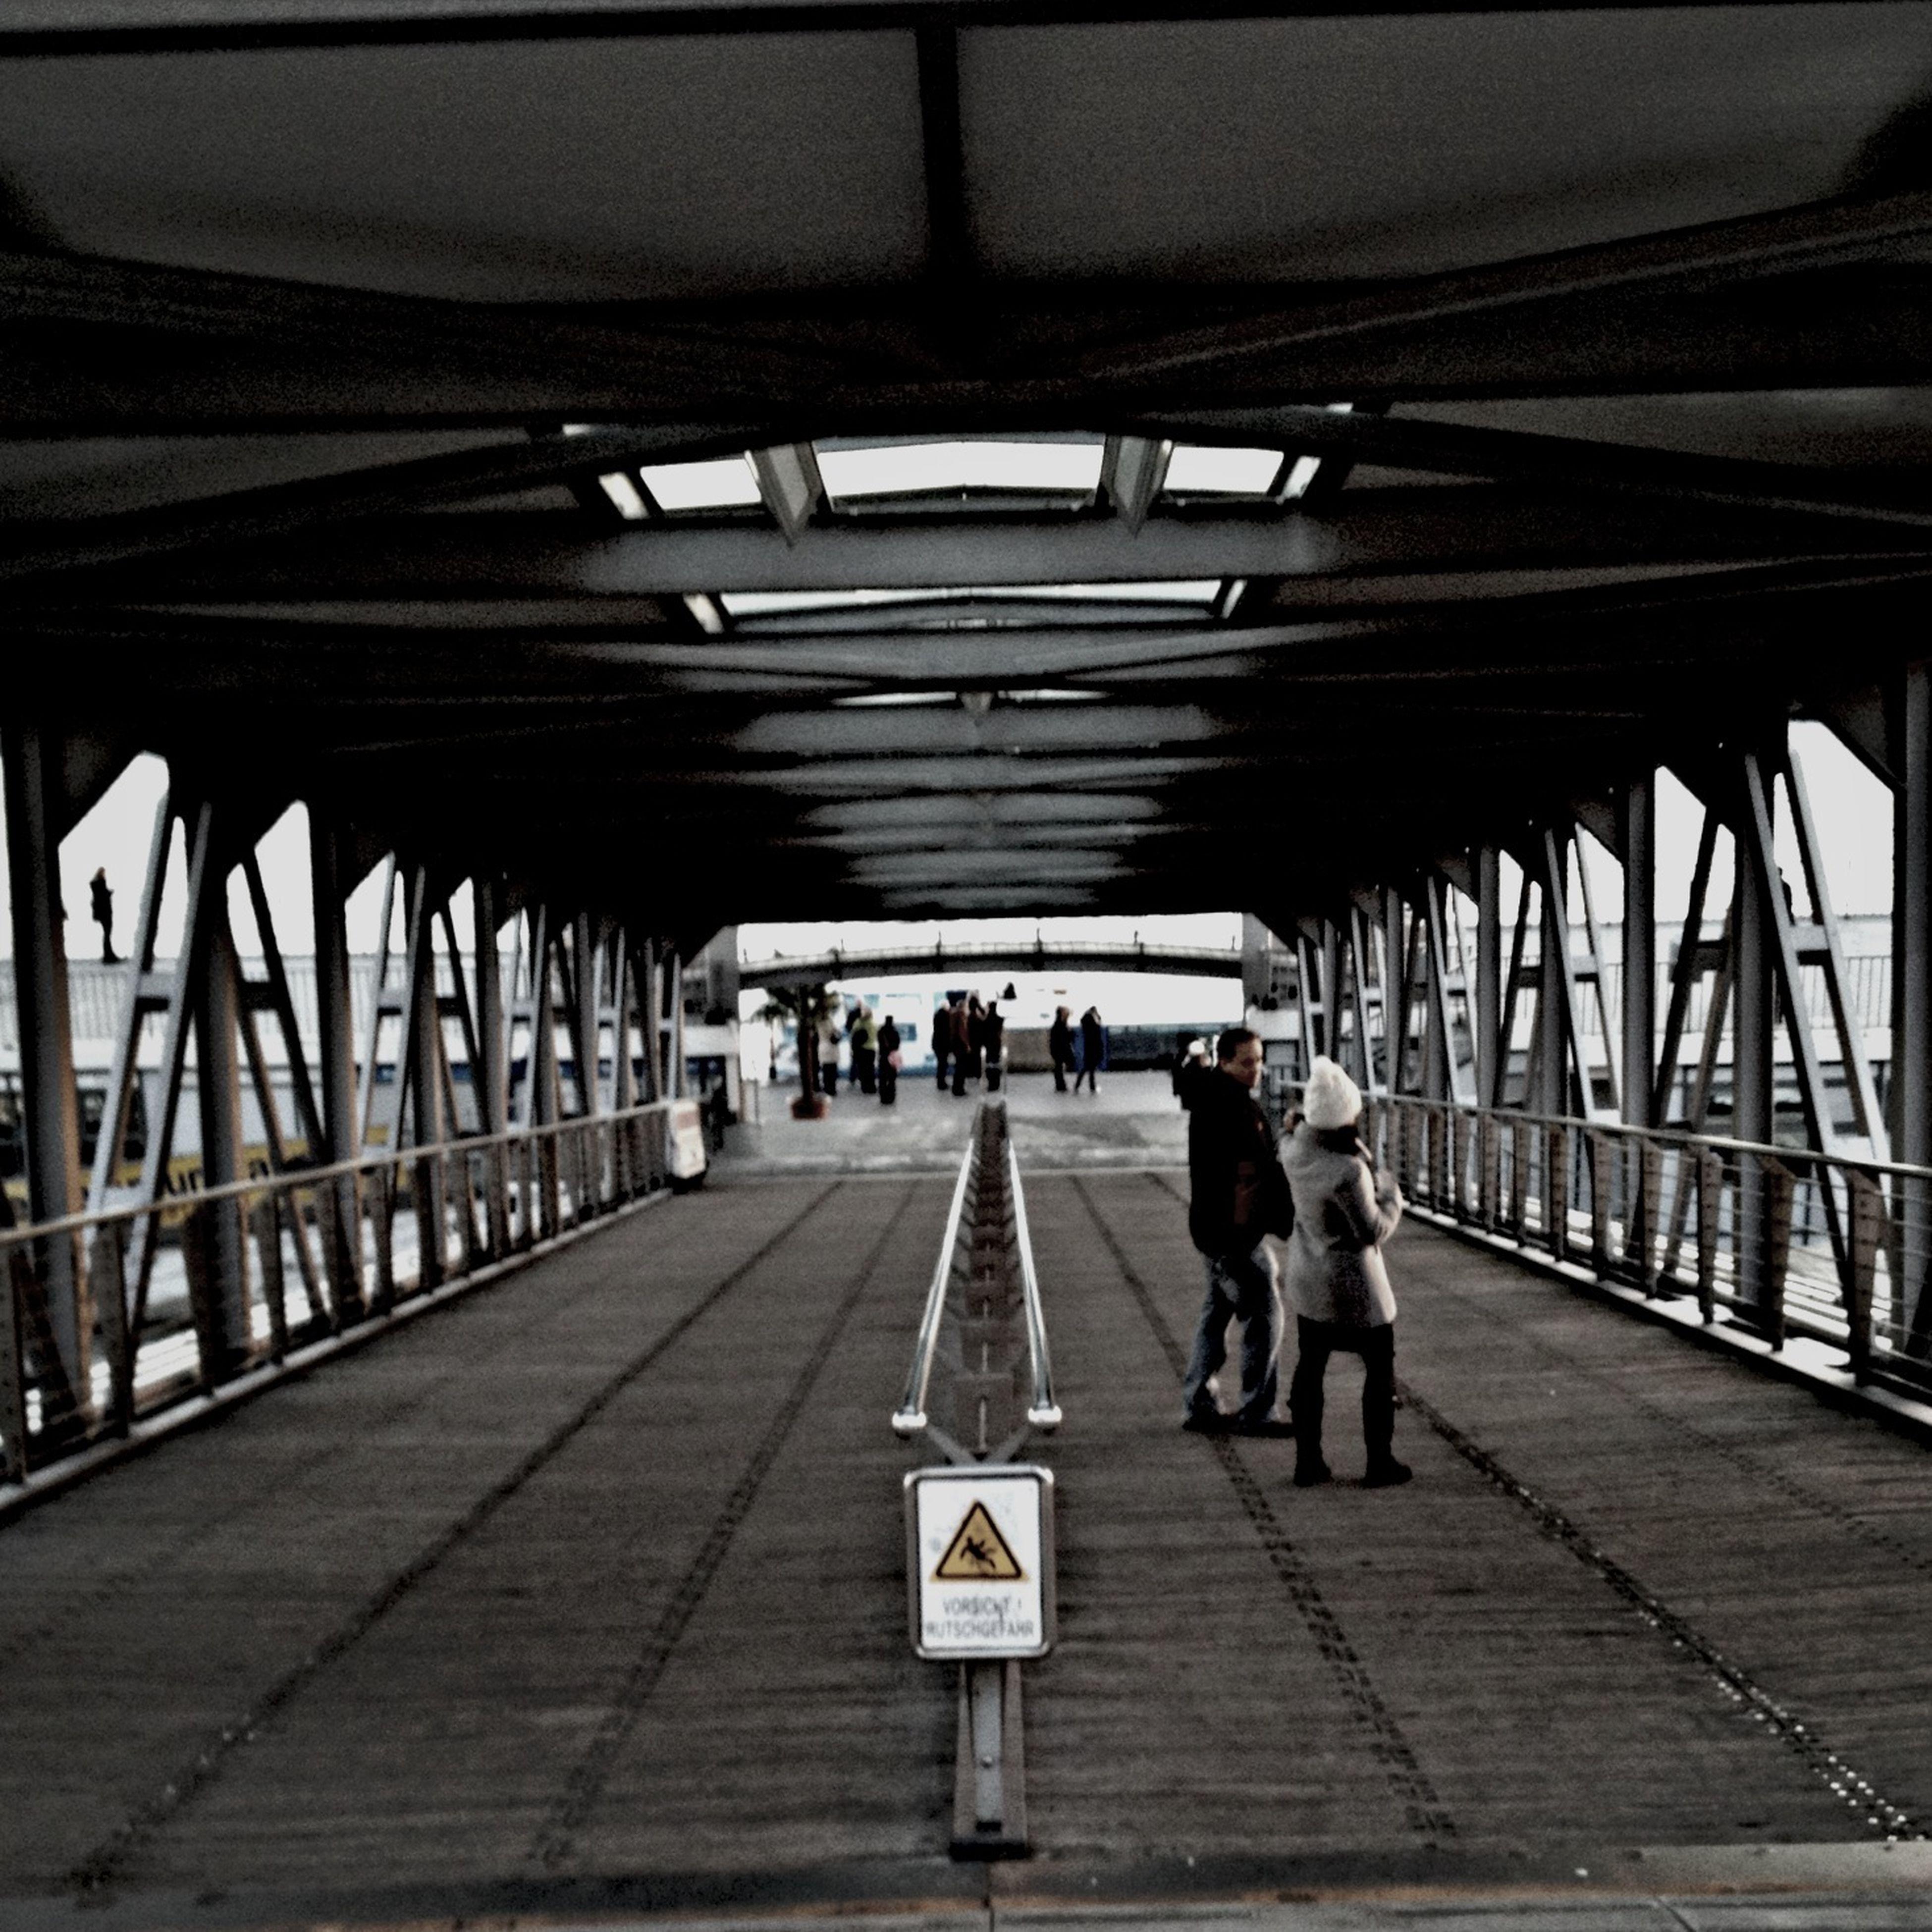 Bw_collection and Hamburg Maritim